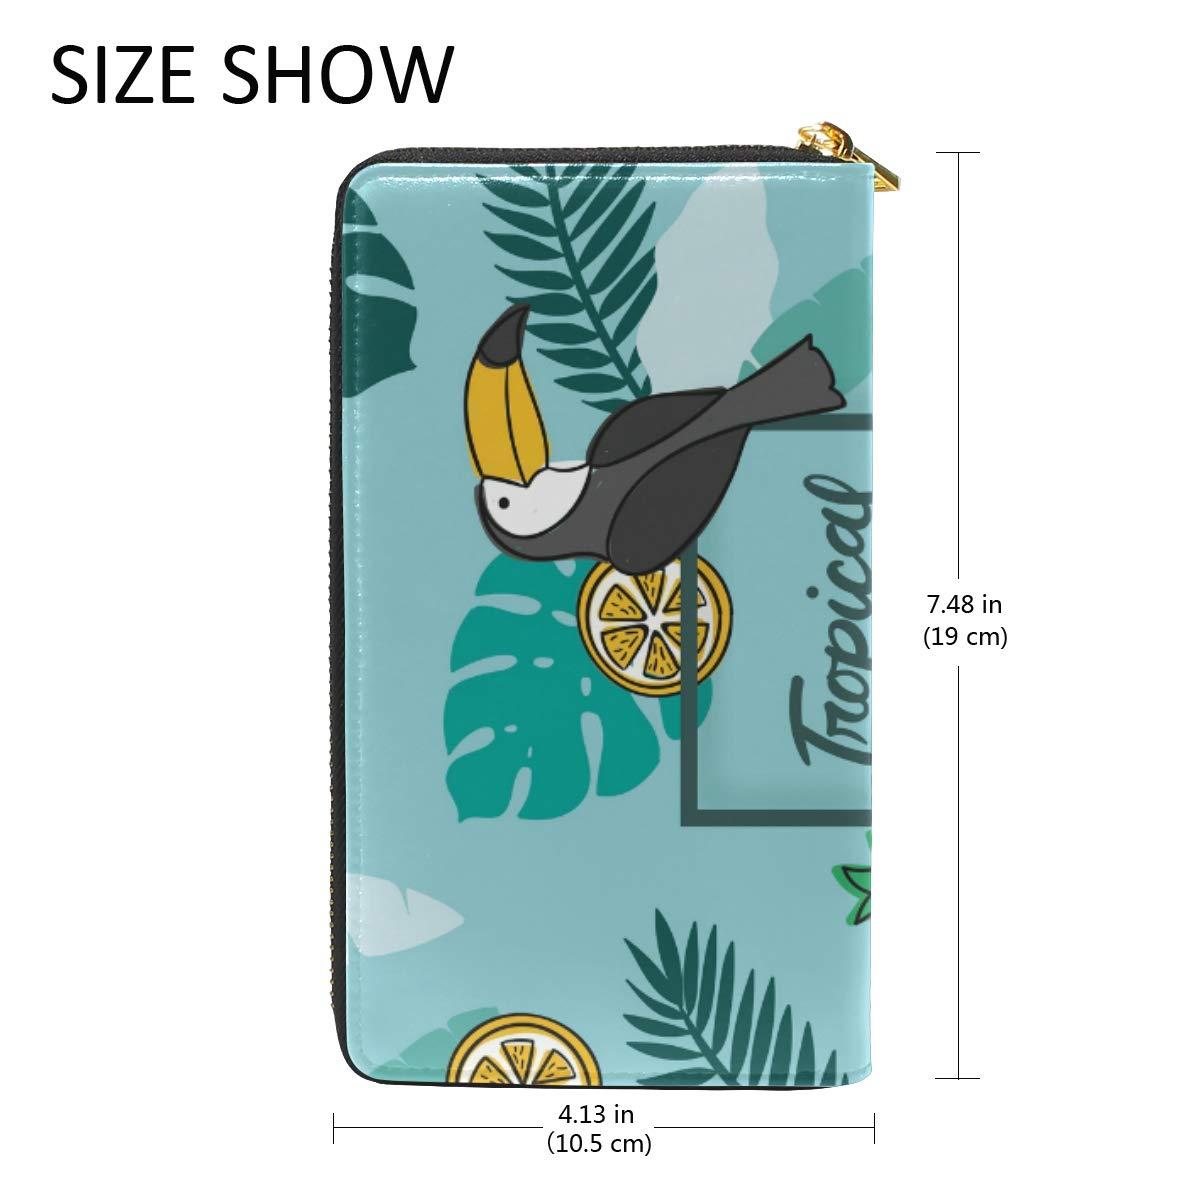 Women Wallet Coin Purse Phone Clutch Pouch Cash Bag,Tropical Background Female Girl Card Change Holder Organizer Storage Key Hold Elegant Handbag Gift